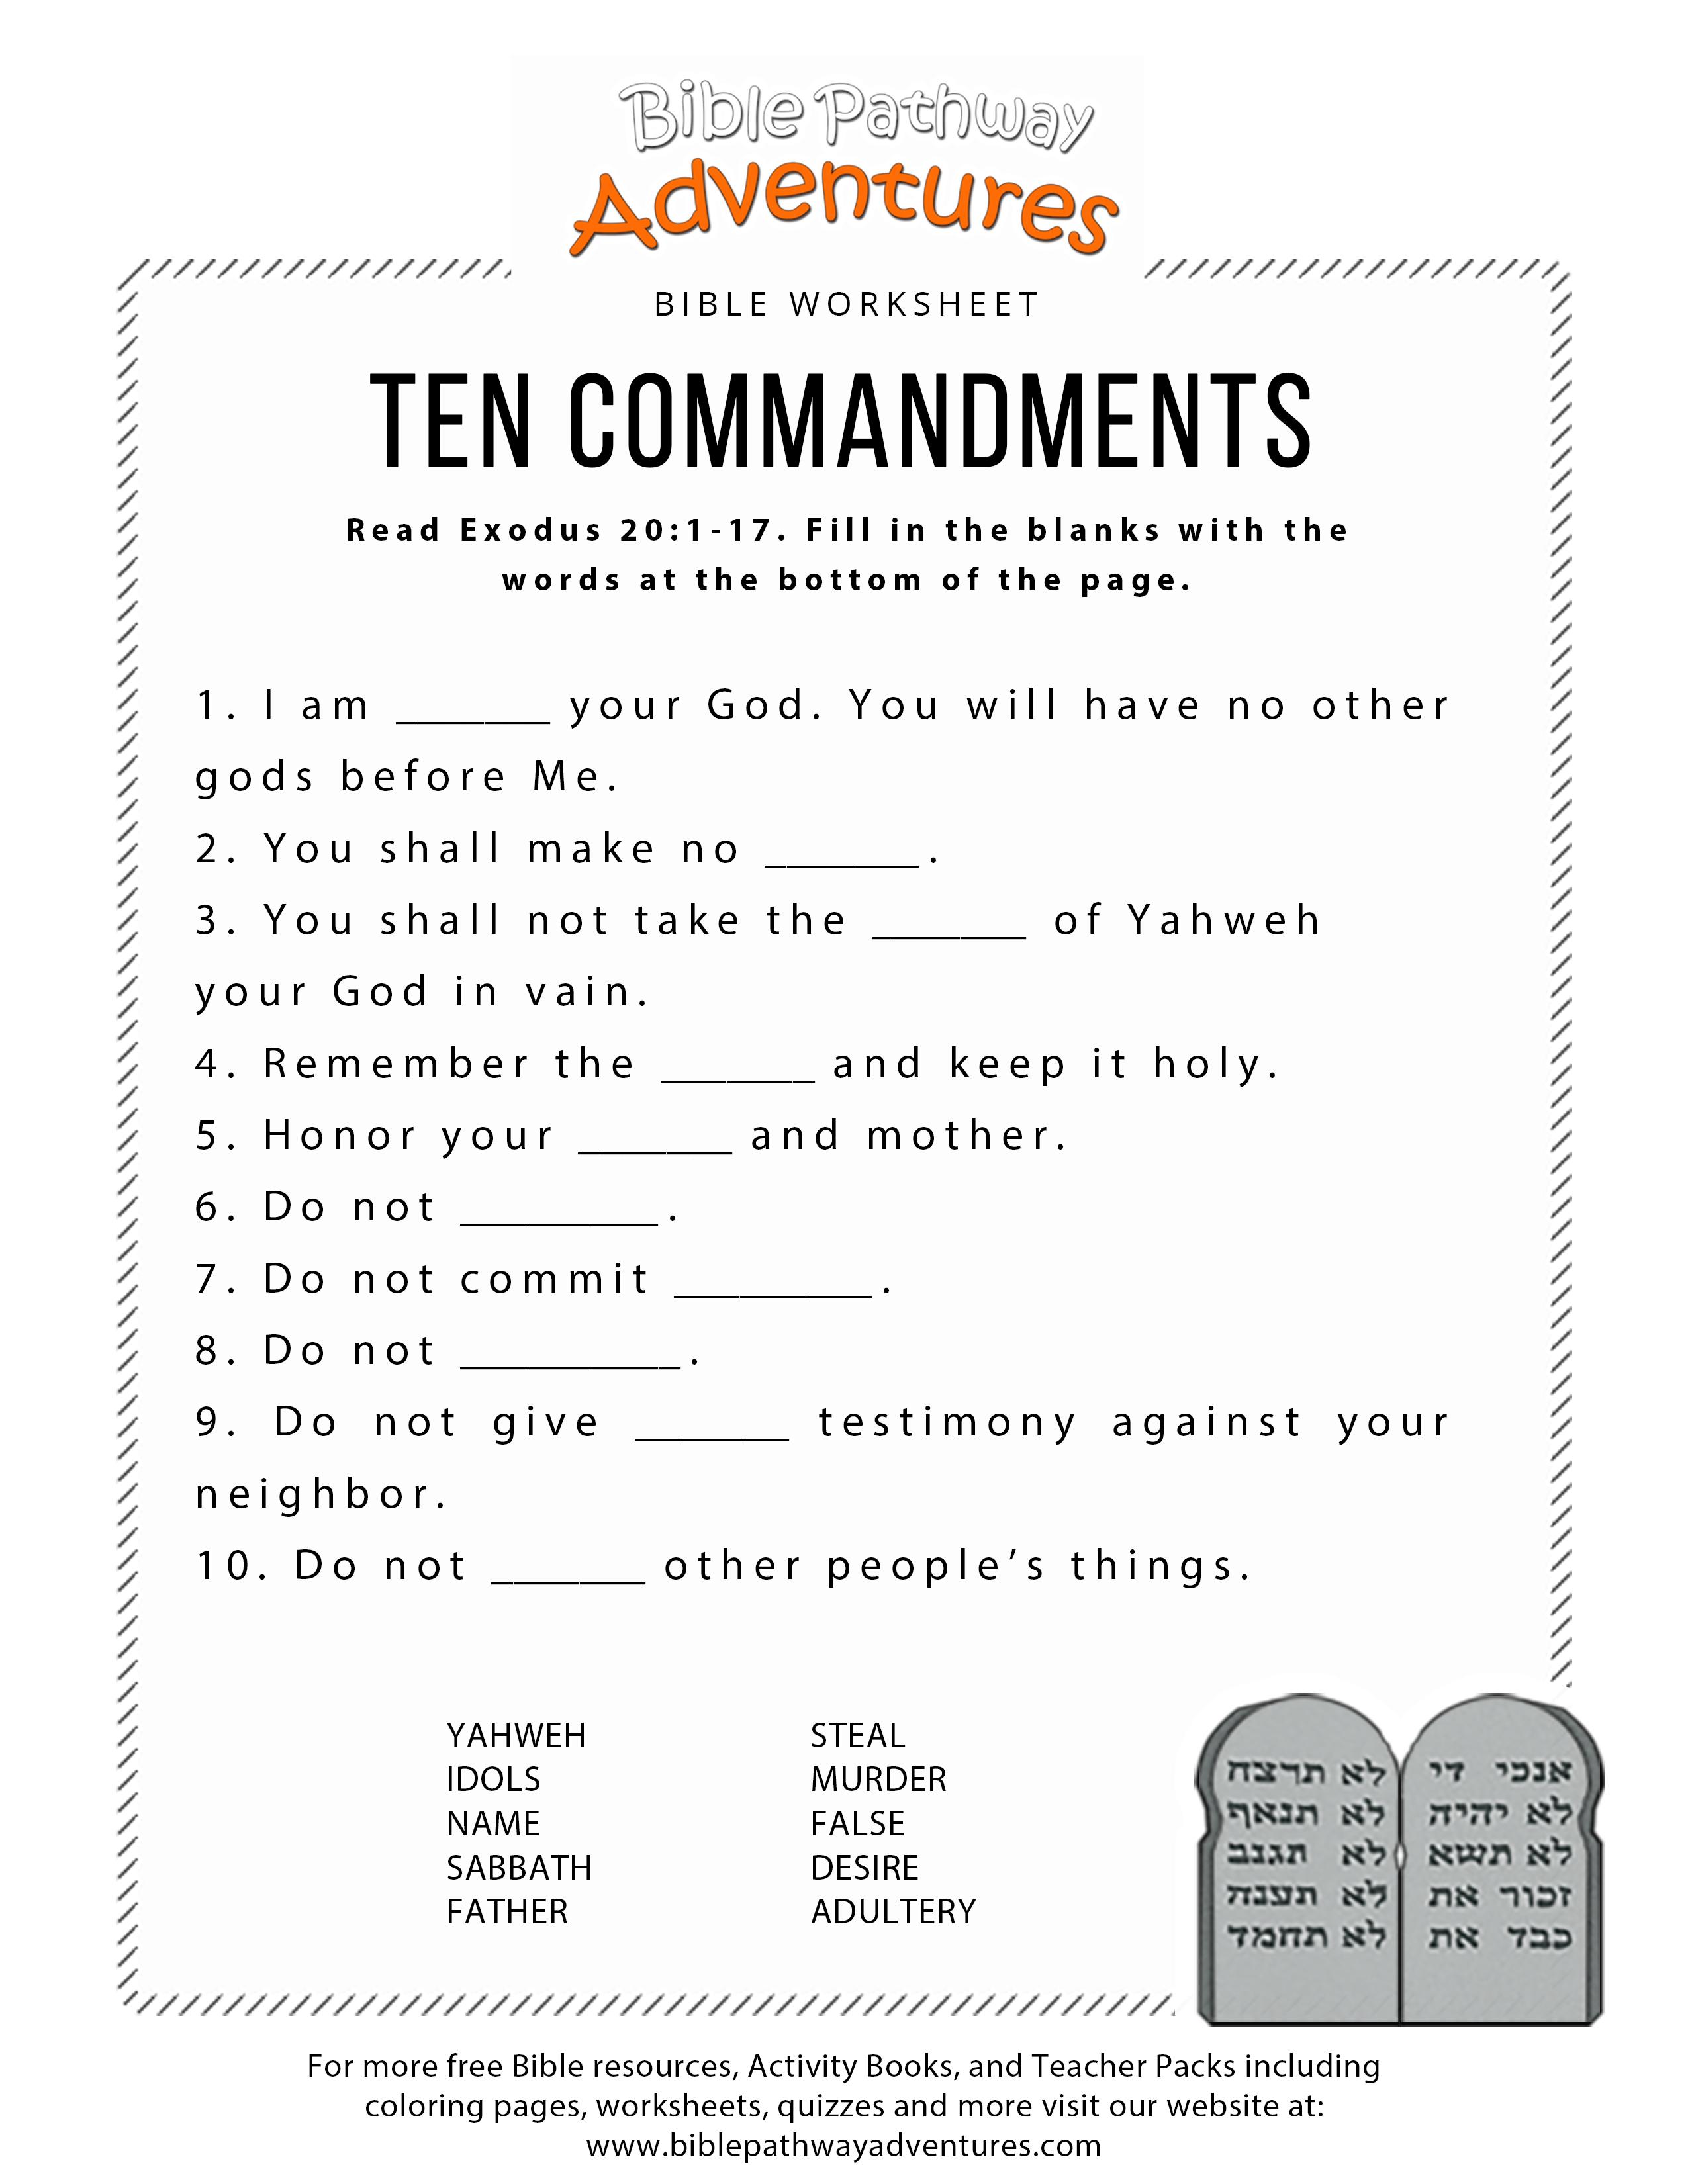 Ten Commandments Worksheet For Kids - Free Printable Ten Commandments Coloring Pages